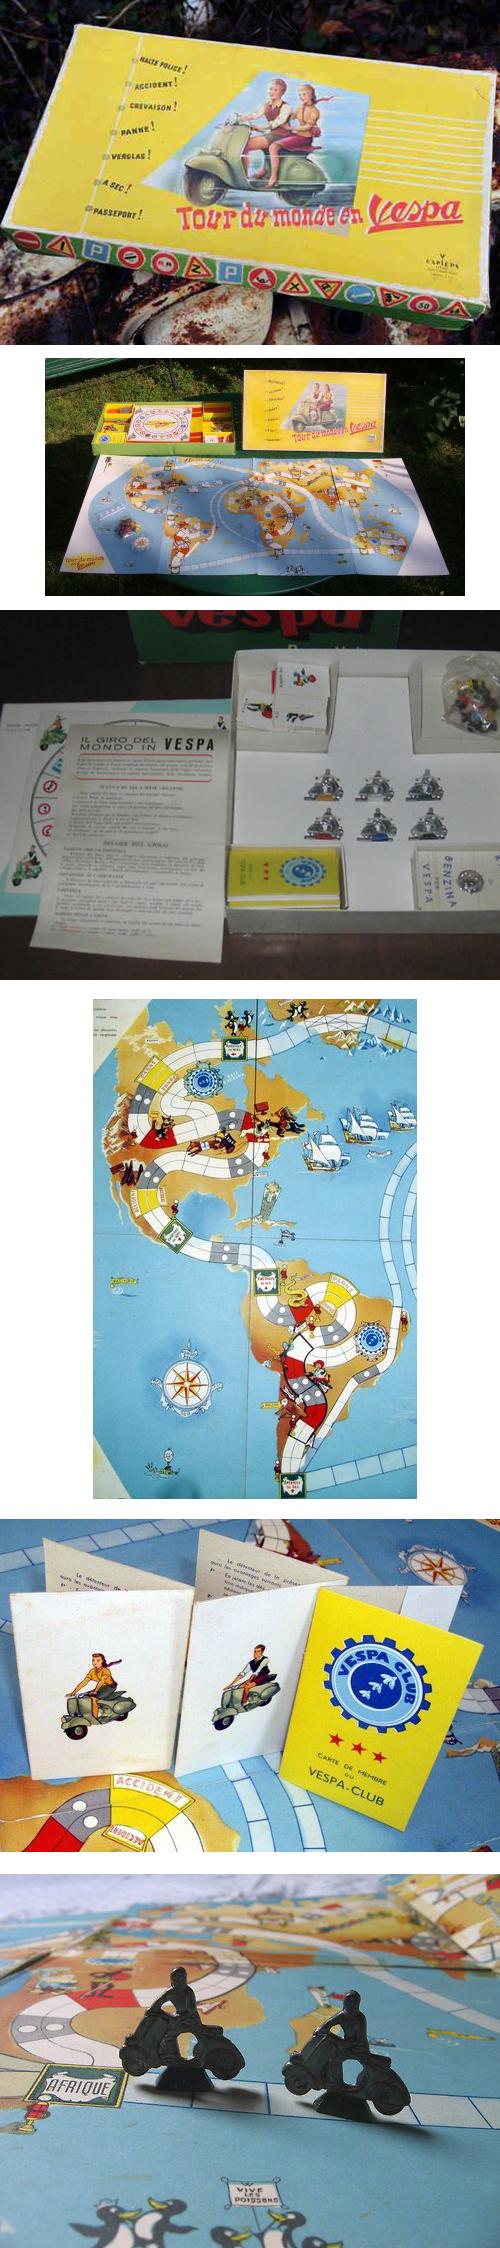 Tour du monde en Vespa Italian Board Game